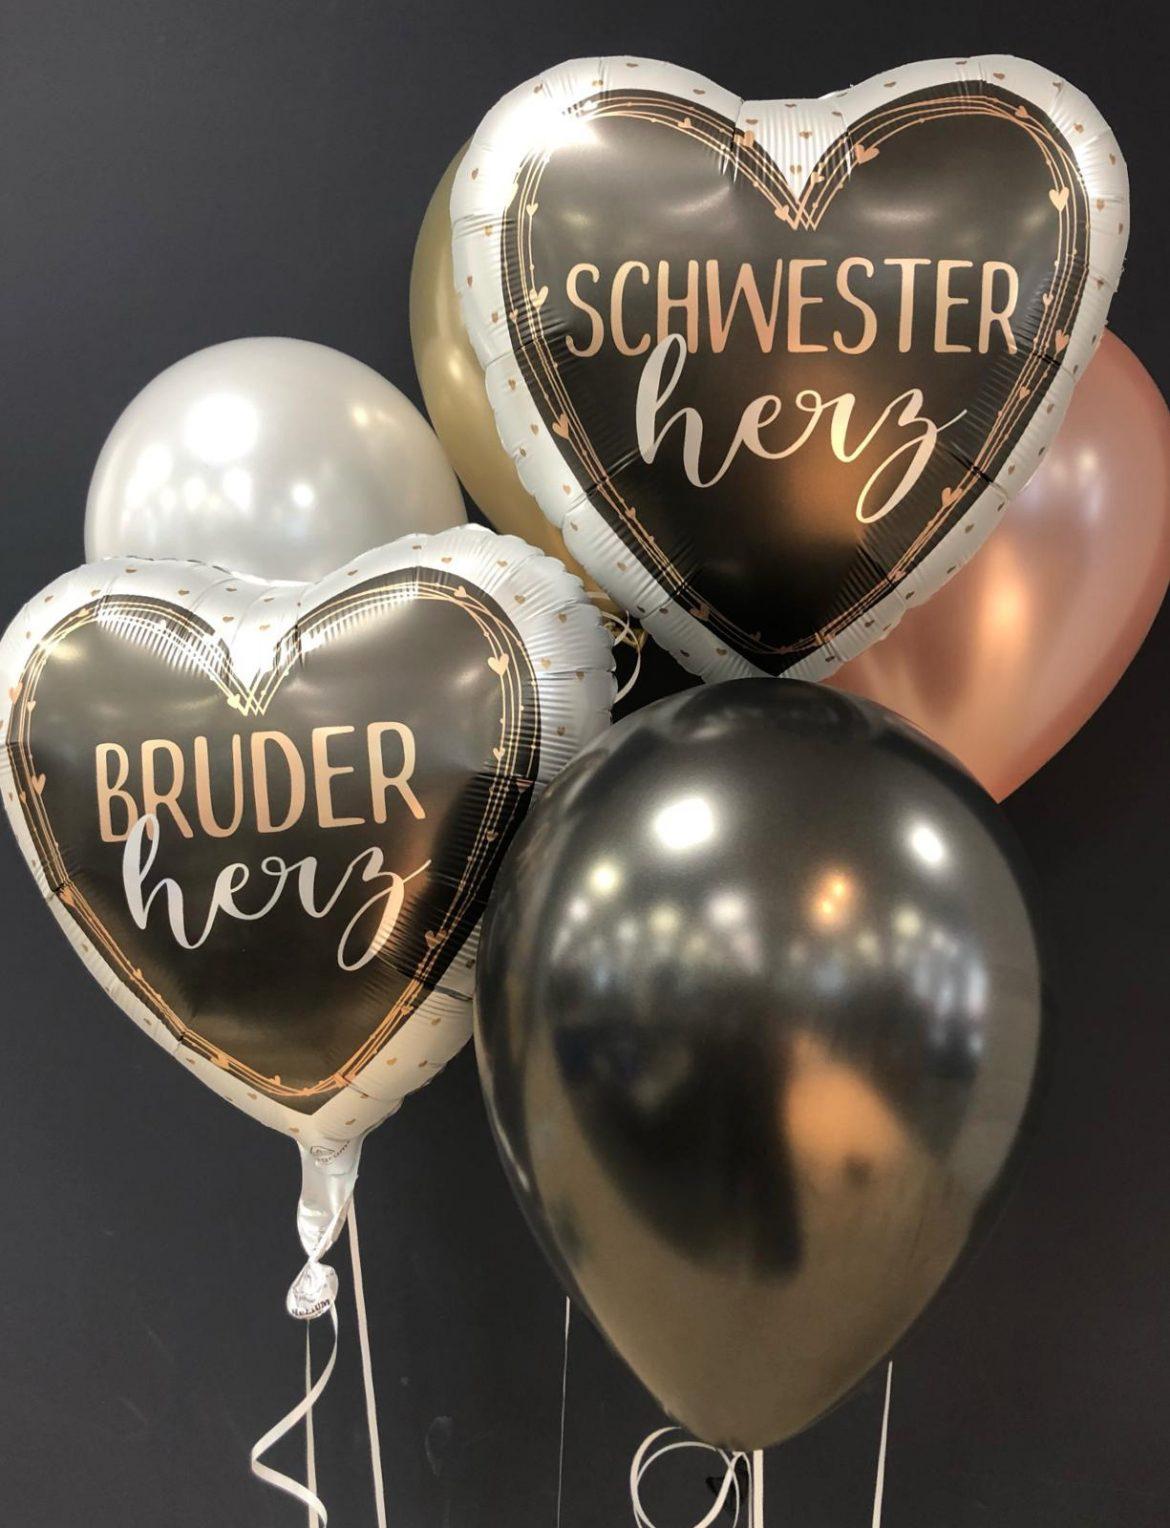 Heliumballon Schwesterherz und Bruderherz